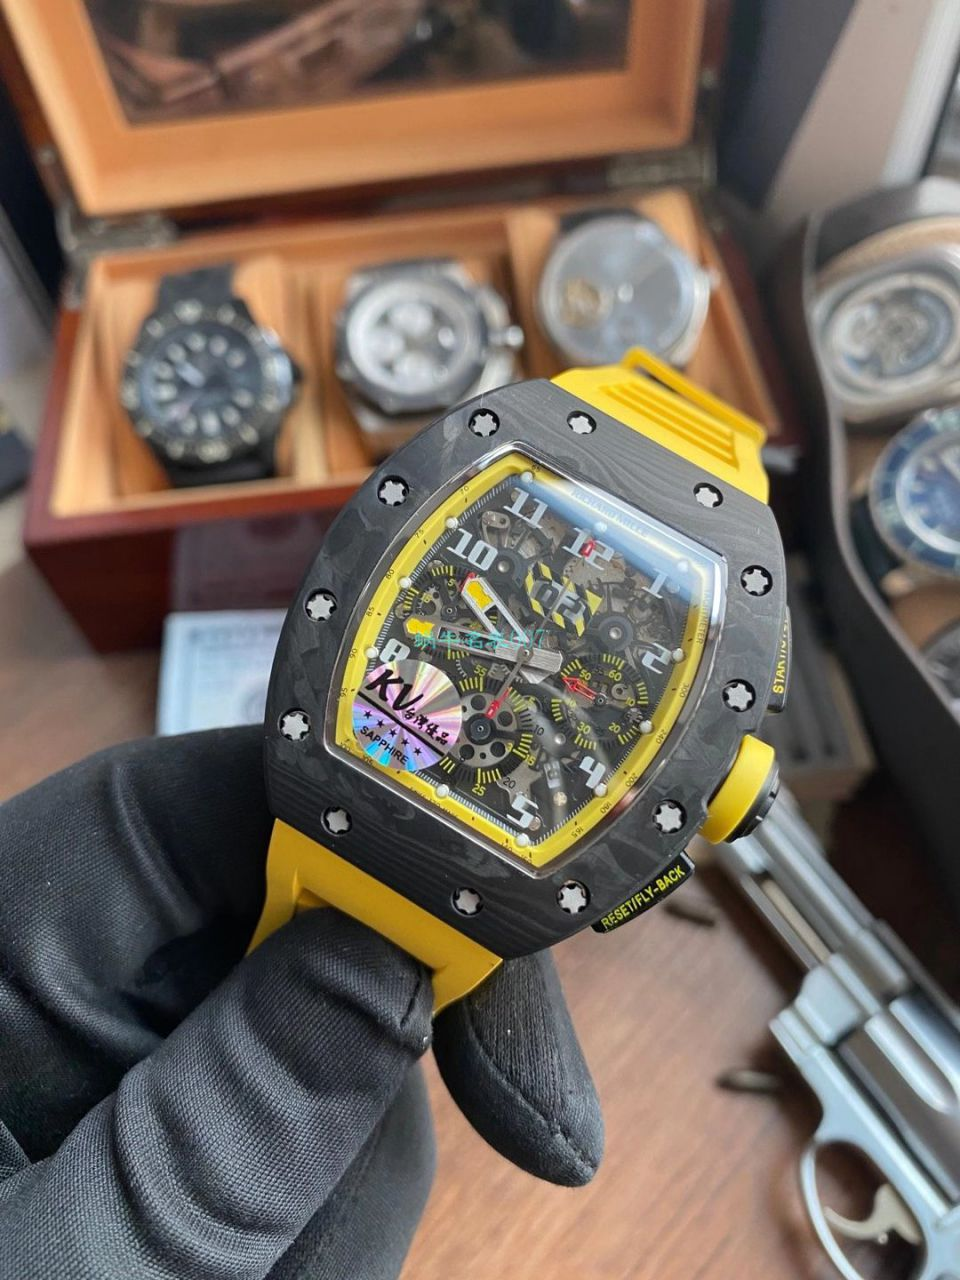 KV厂理查德米勒RM011 Yellow Storm黄色风暴顶级复刻手表 / KVRM011YellowStormB